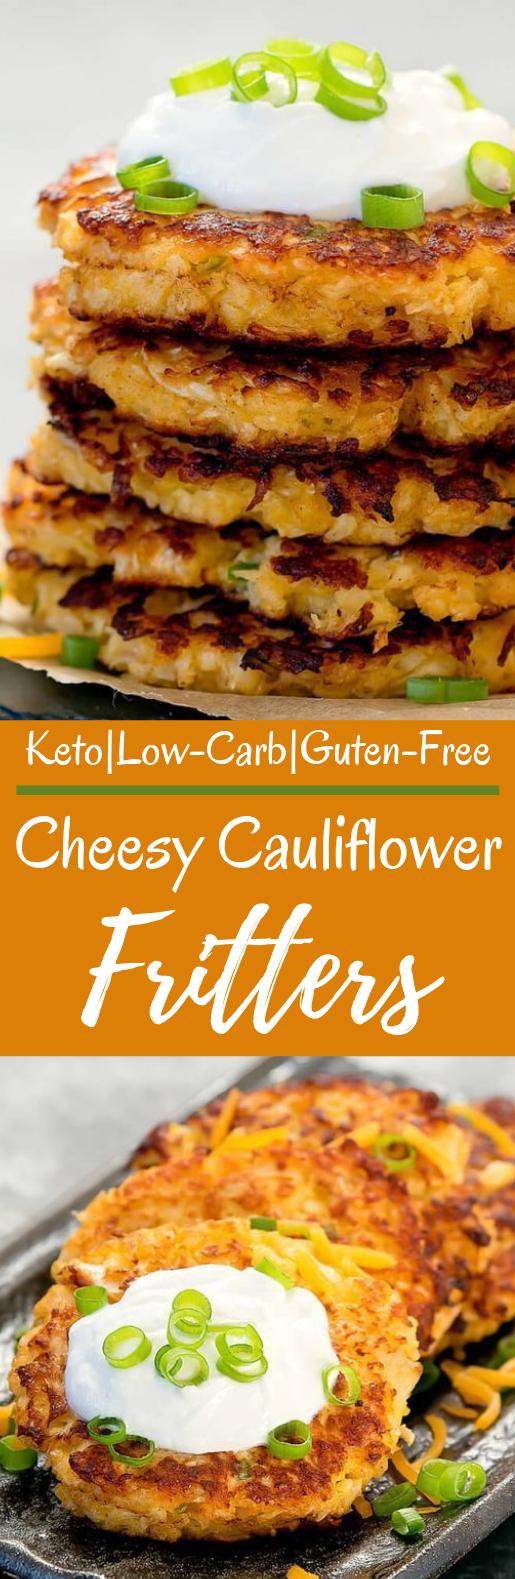 Cheesy Cauliflower Fritters #lowcarb #healthy